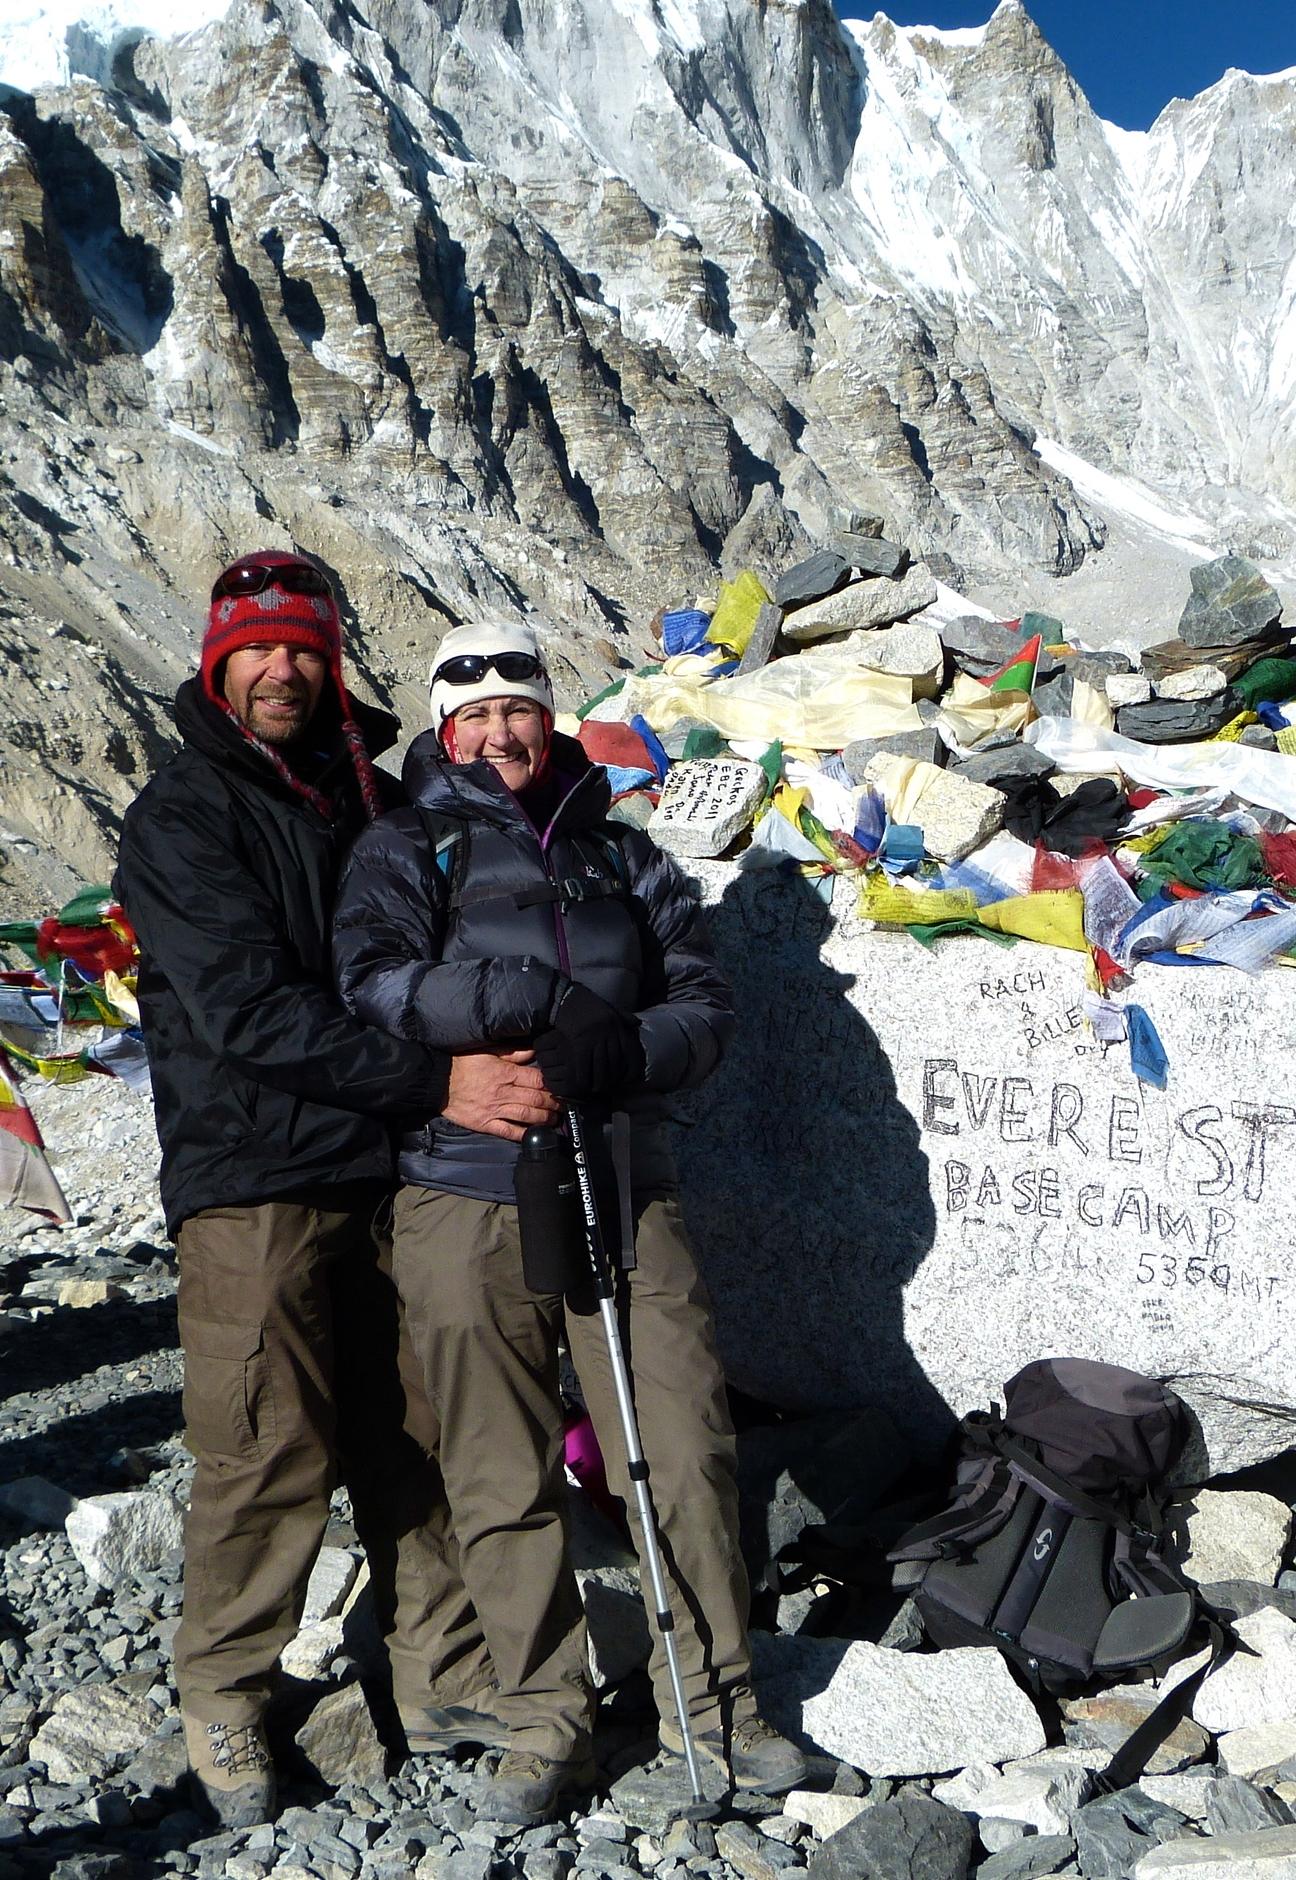 Everest base camp christmas 2011